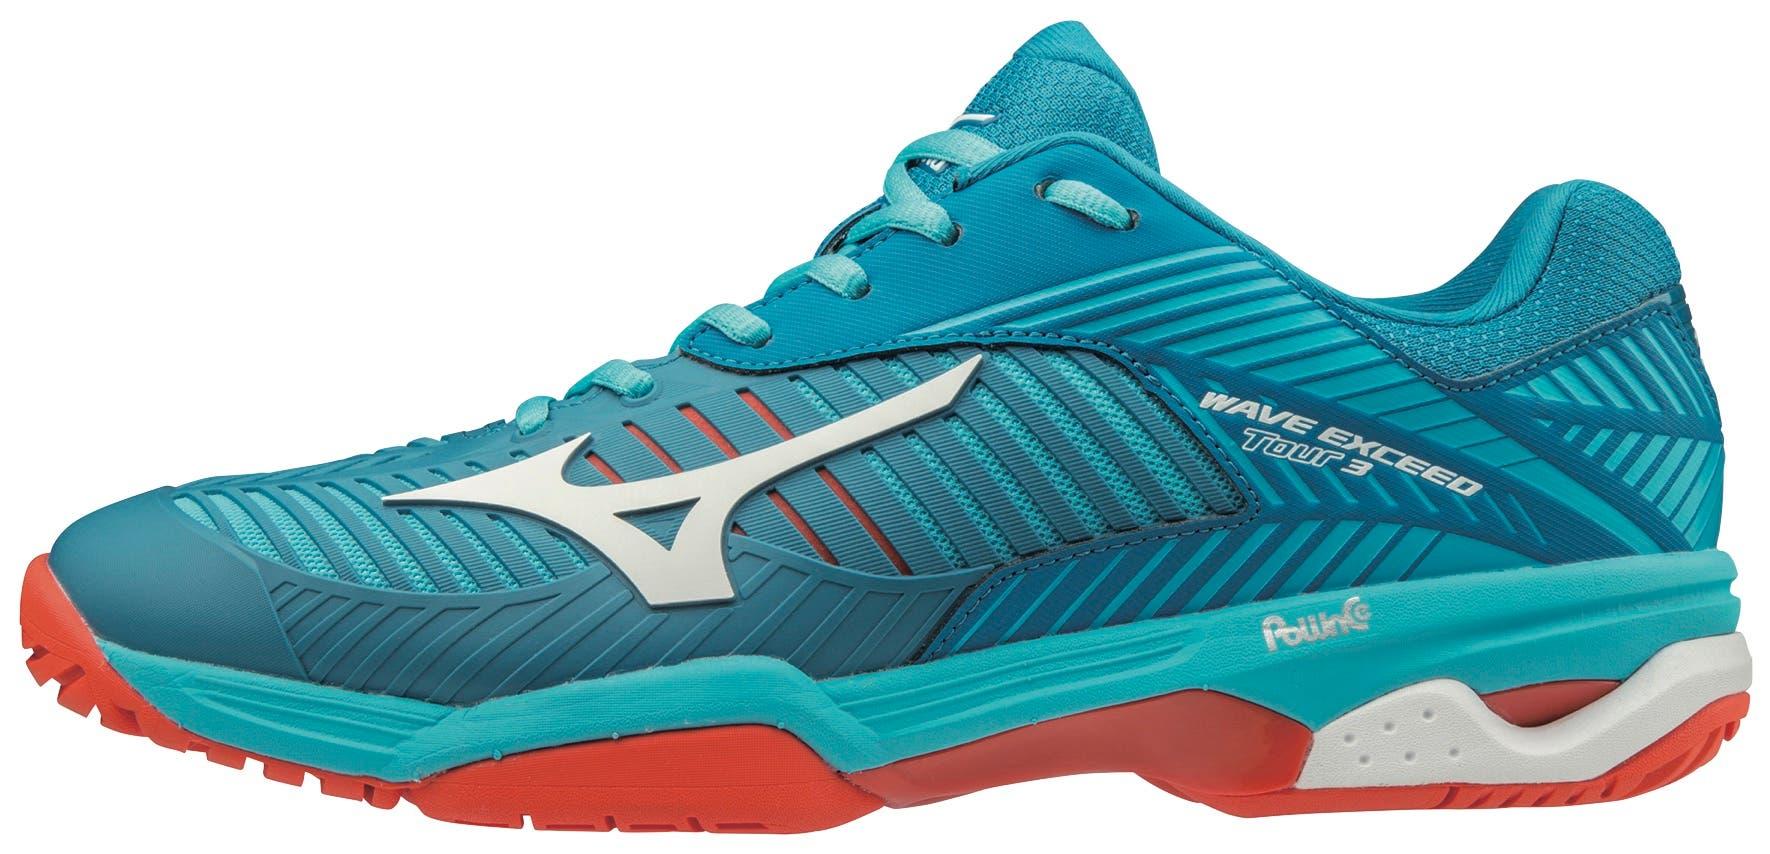 scarpa da tennis caratteristiche